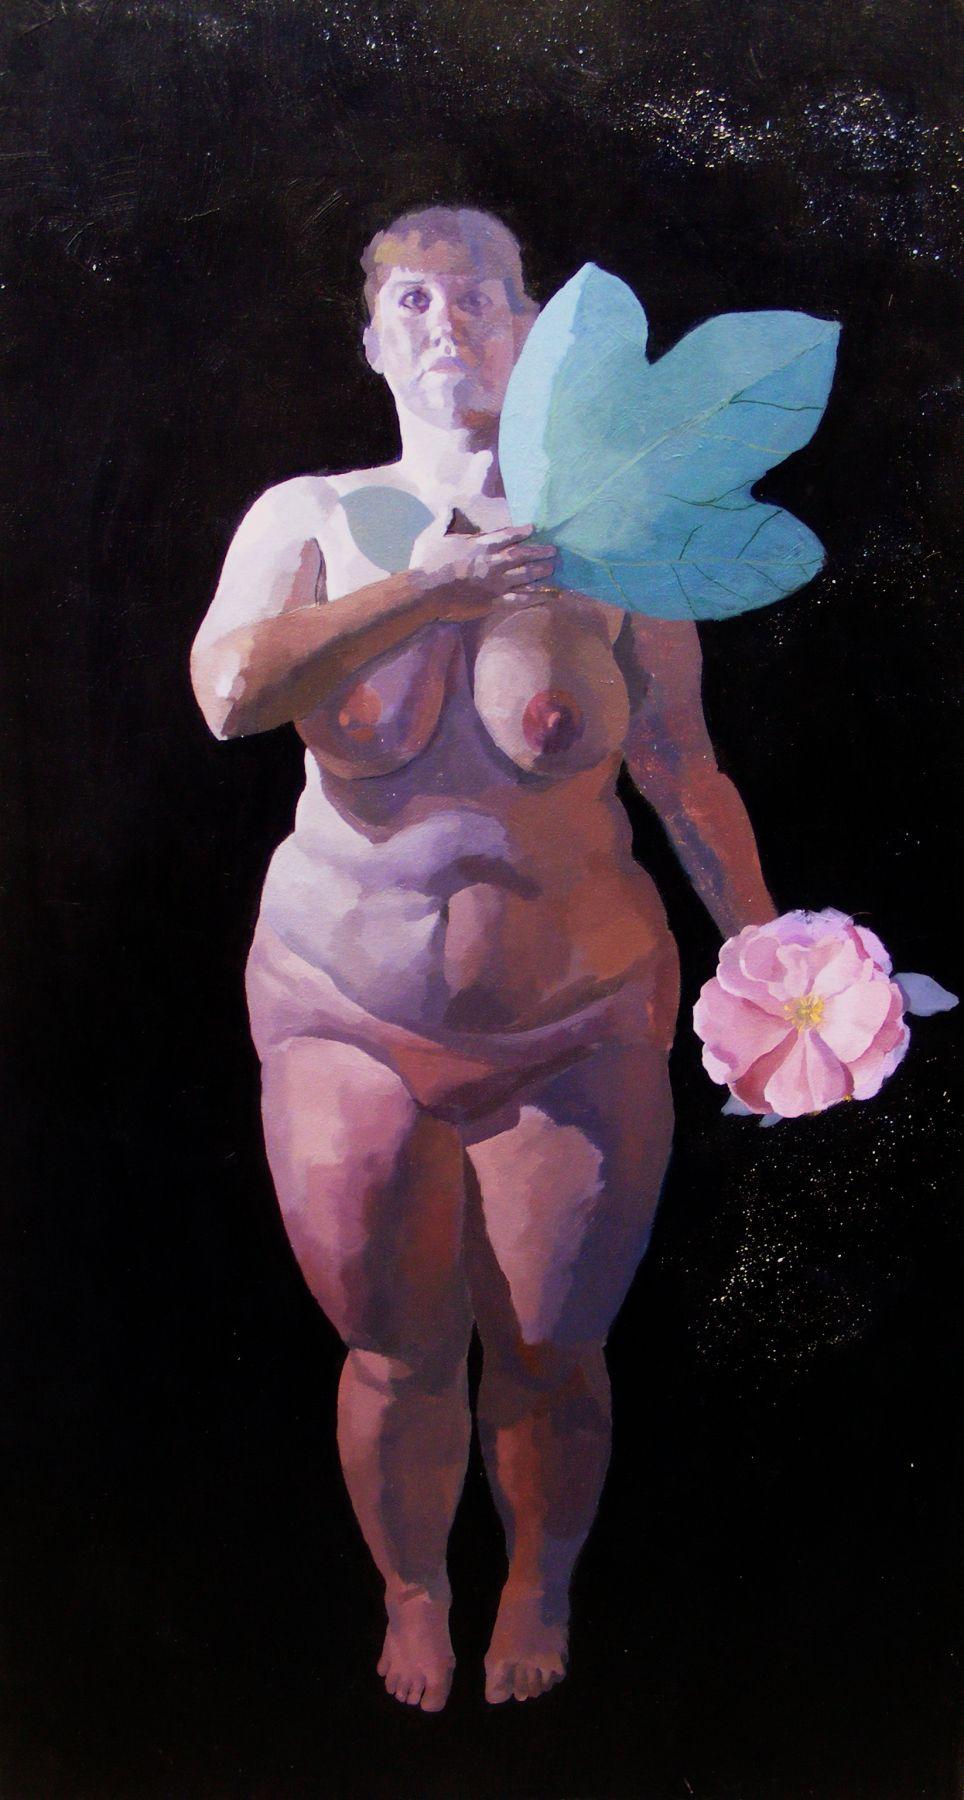 "Study Of The Heart, 72"" x 38"", Acrylic On Canvas"